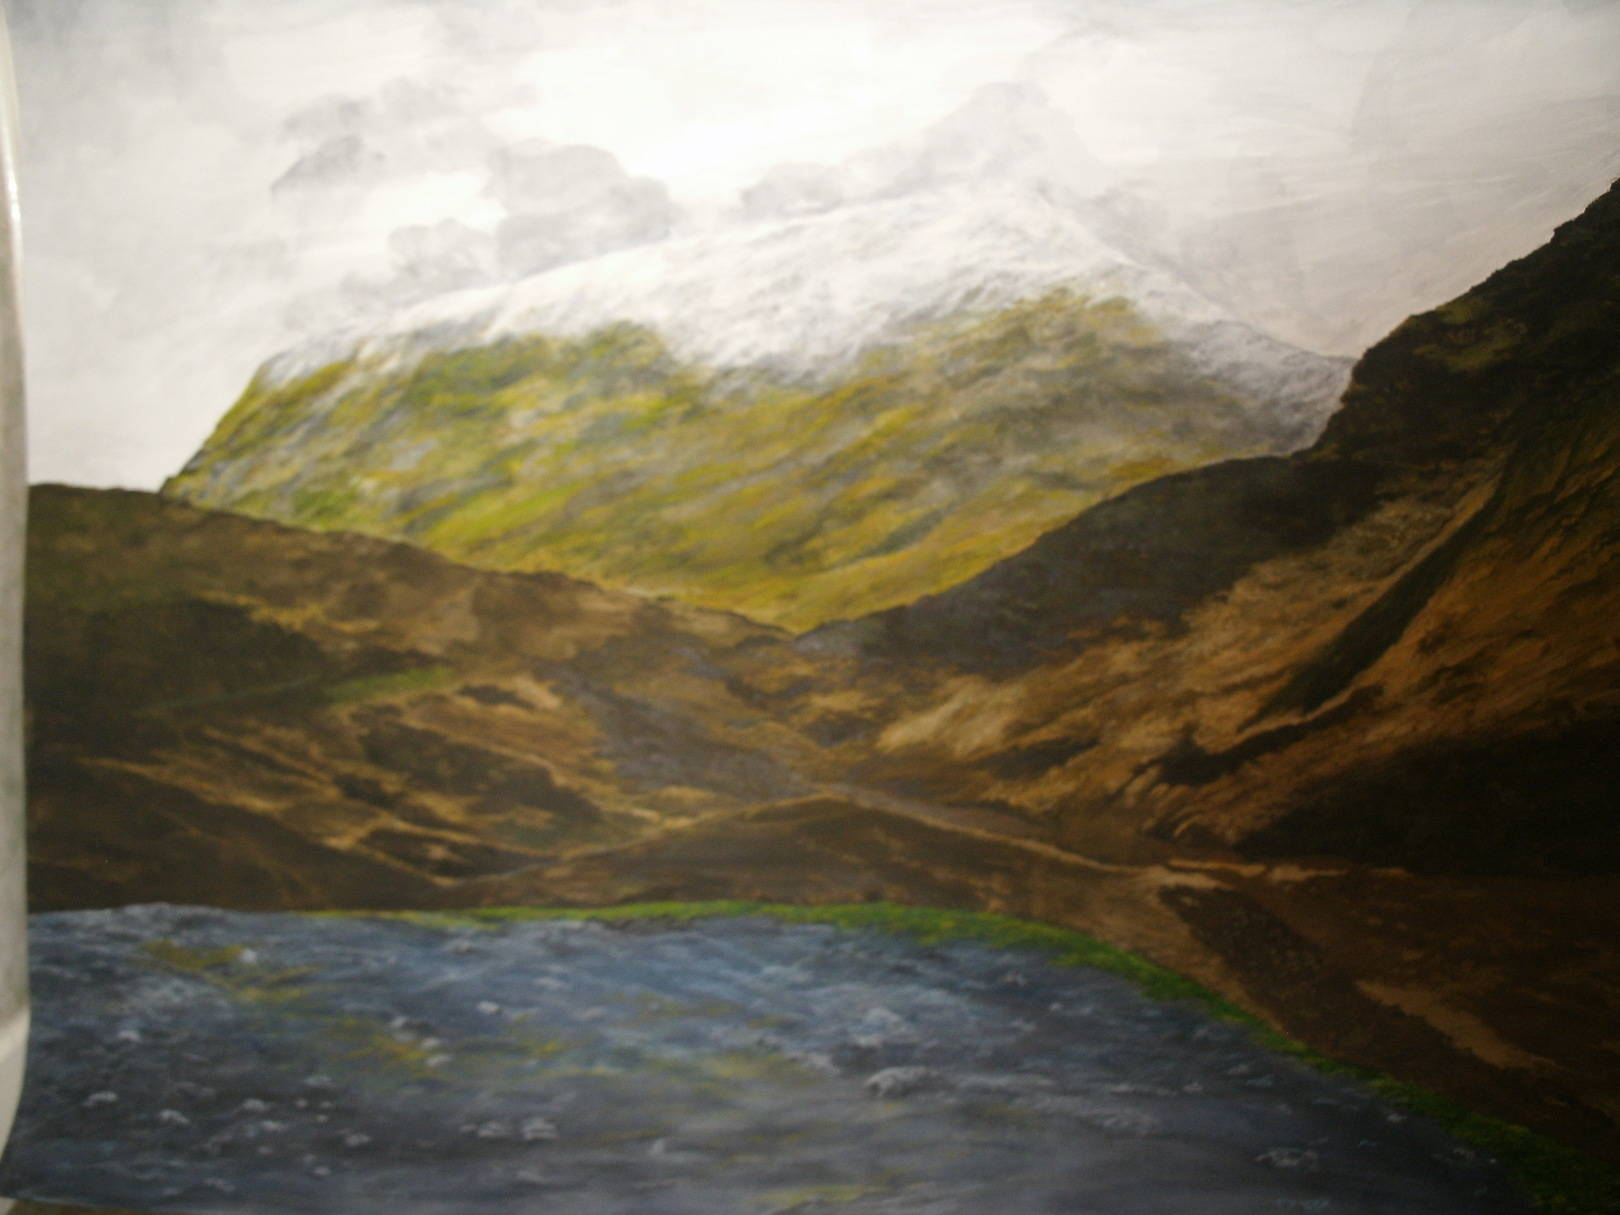 Ben Nevis Mountain, Scotland United Kingdom